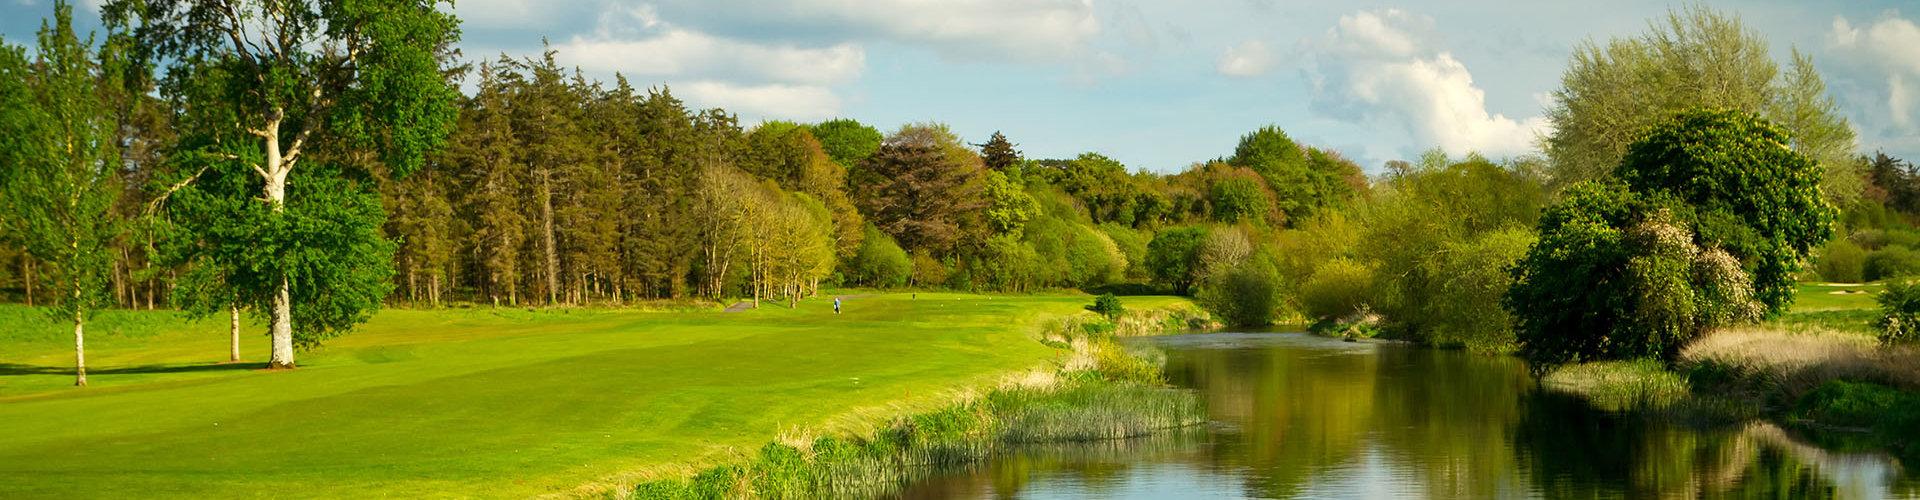 Golf in Irlanda